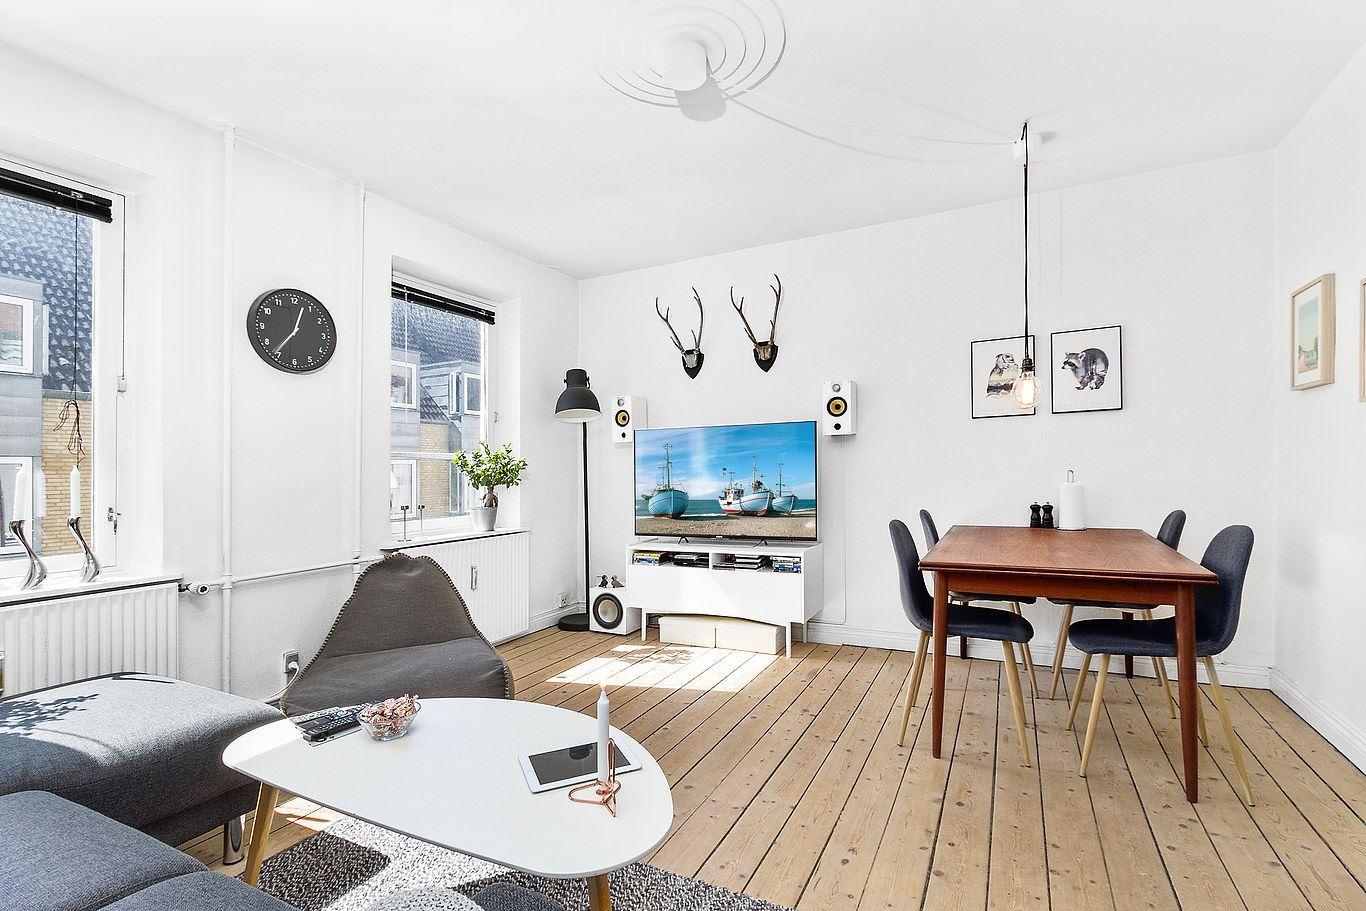 Kayerødsgade 27, 1 tv, 9000 Aalborg